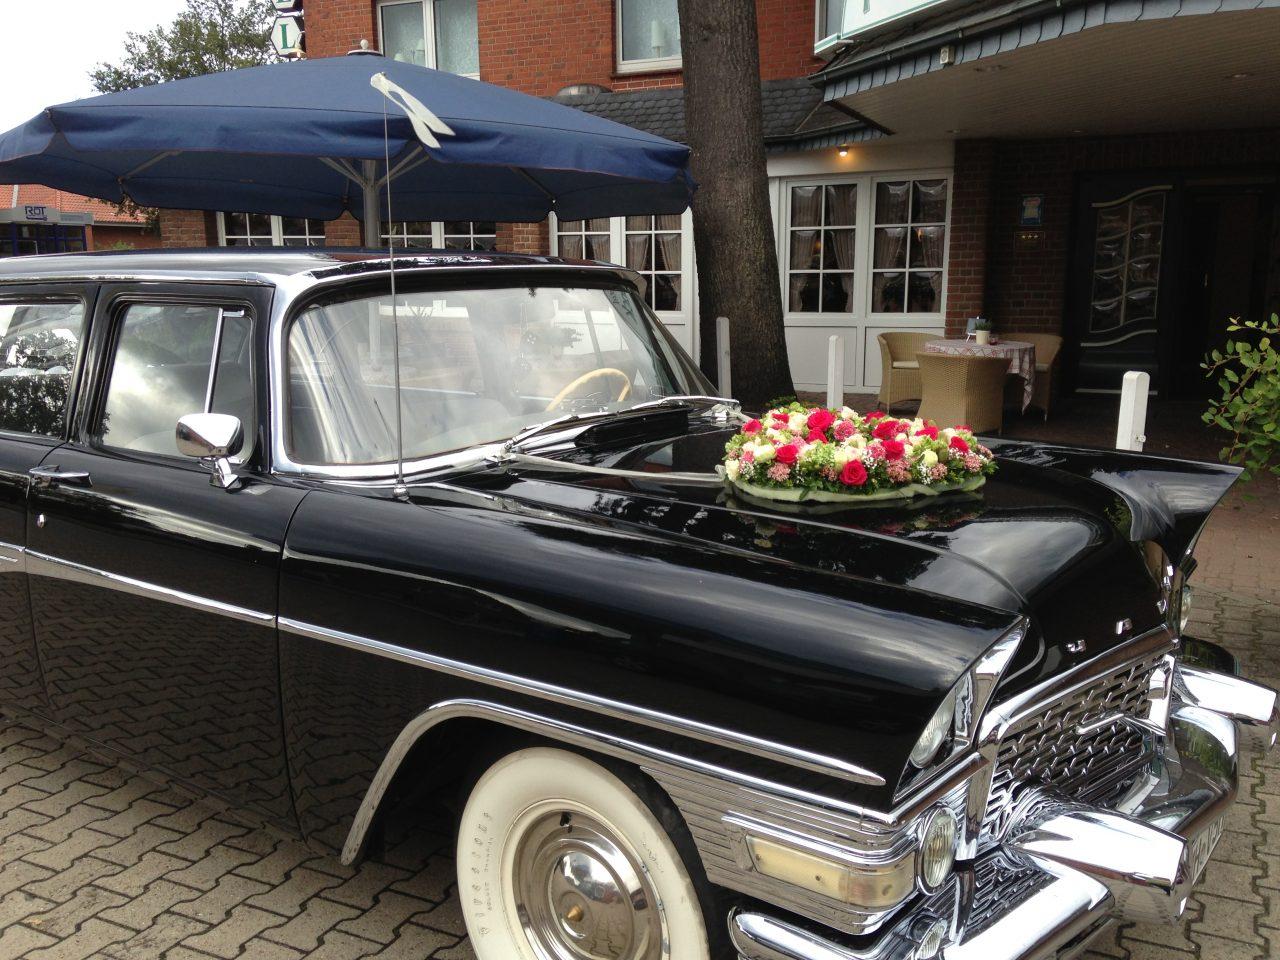 Landhotel Franck Hochzeitsauto